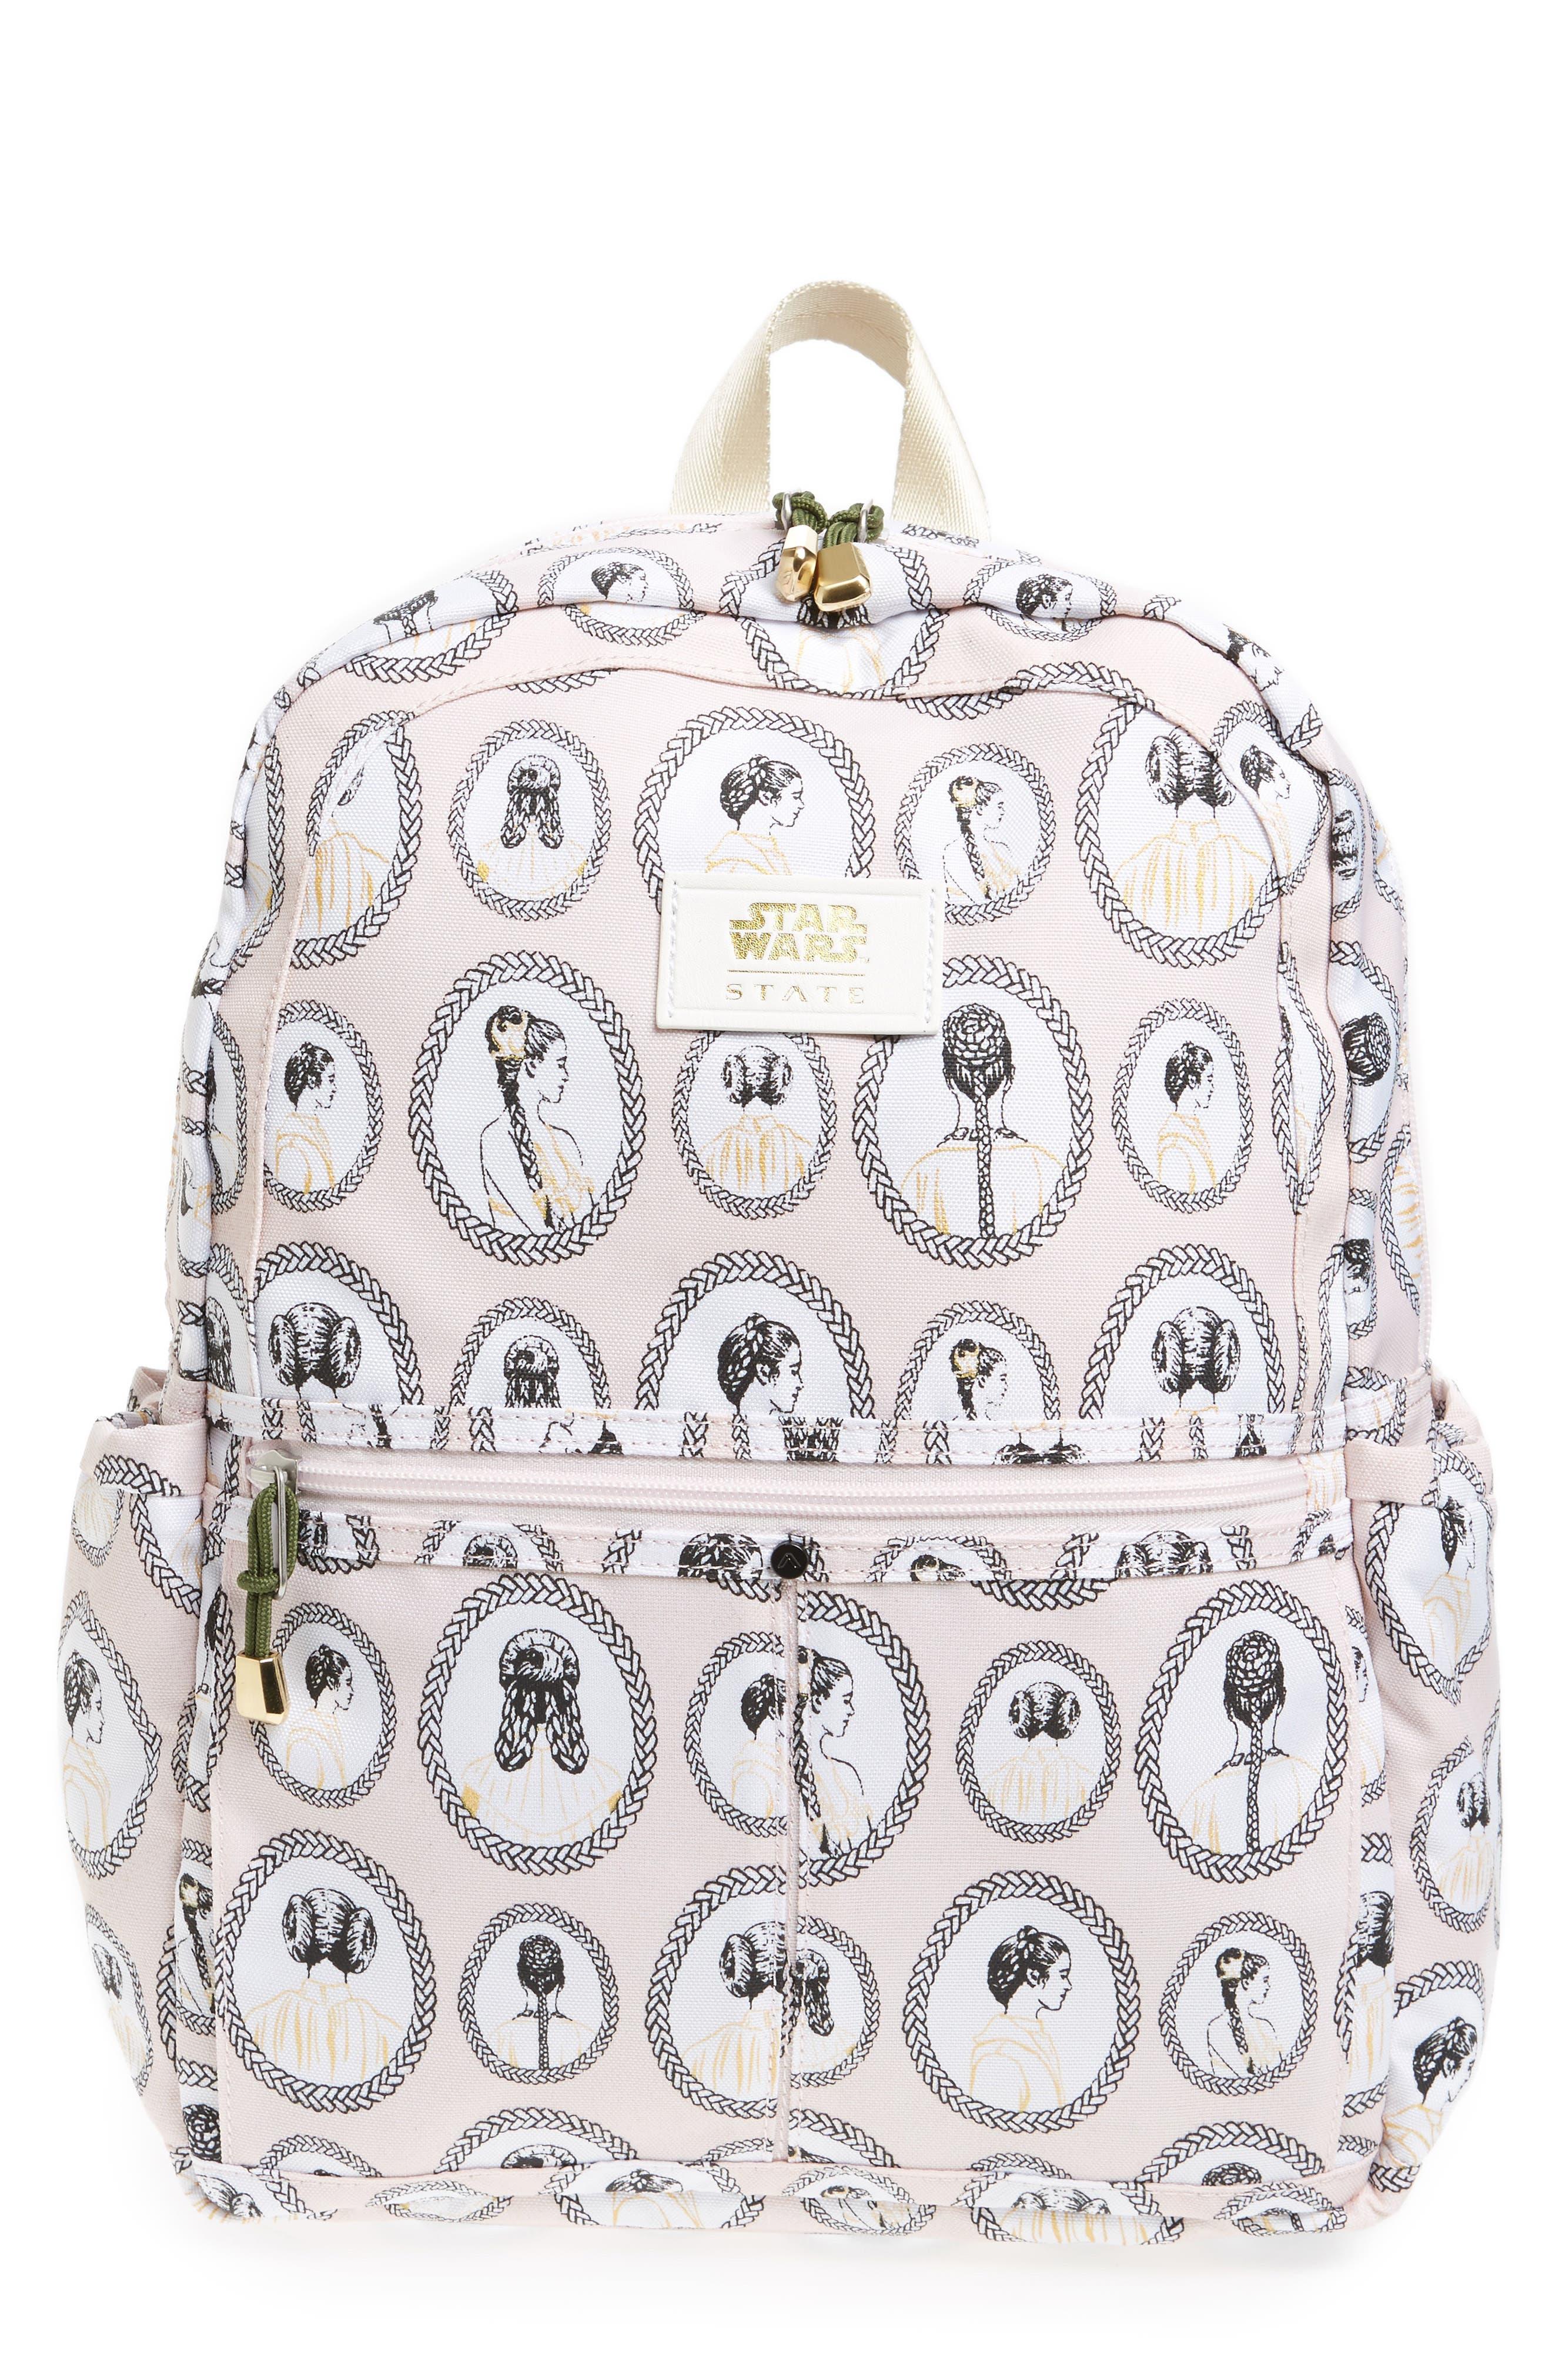 Star Wars - Princess Leia Kane Backpack,                         Main,                         color,